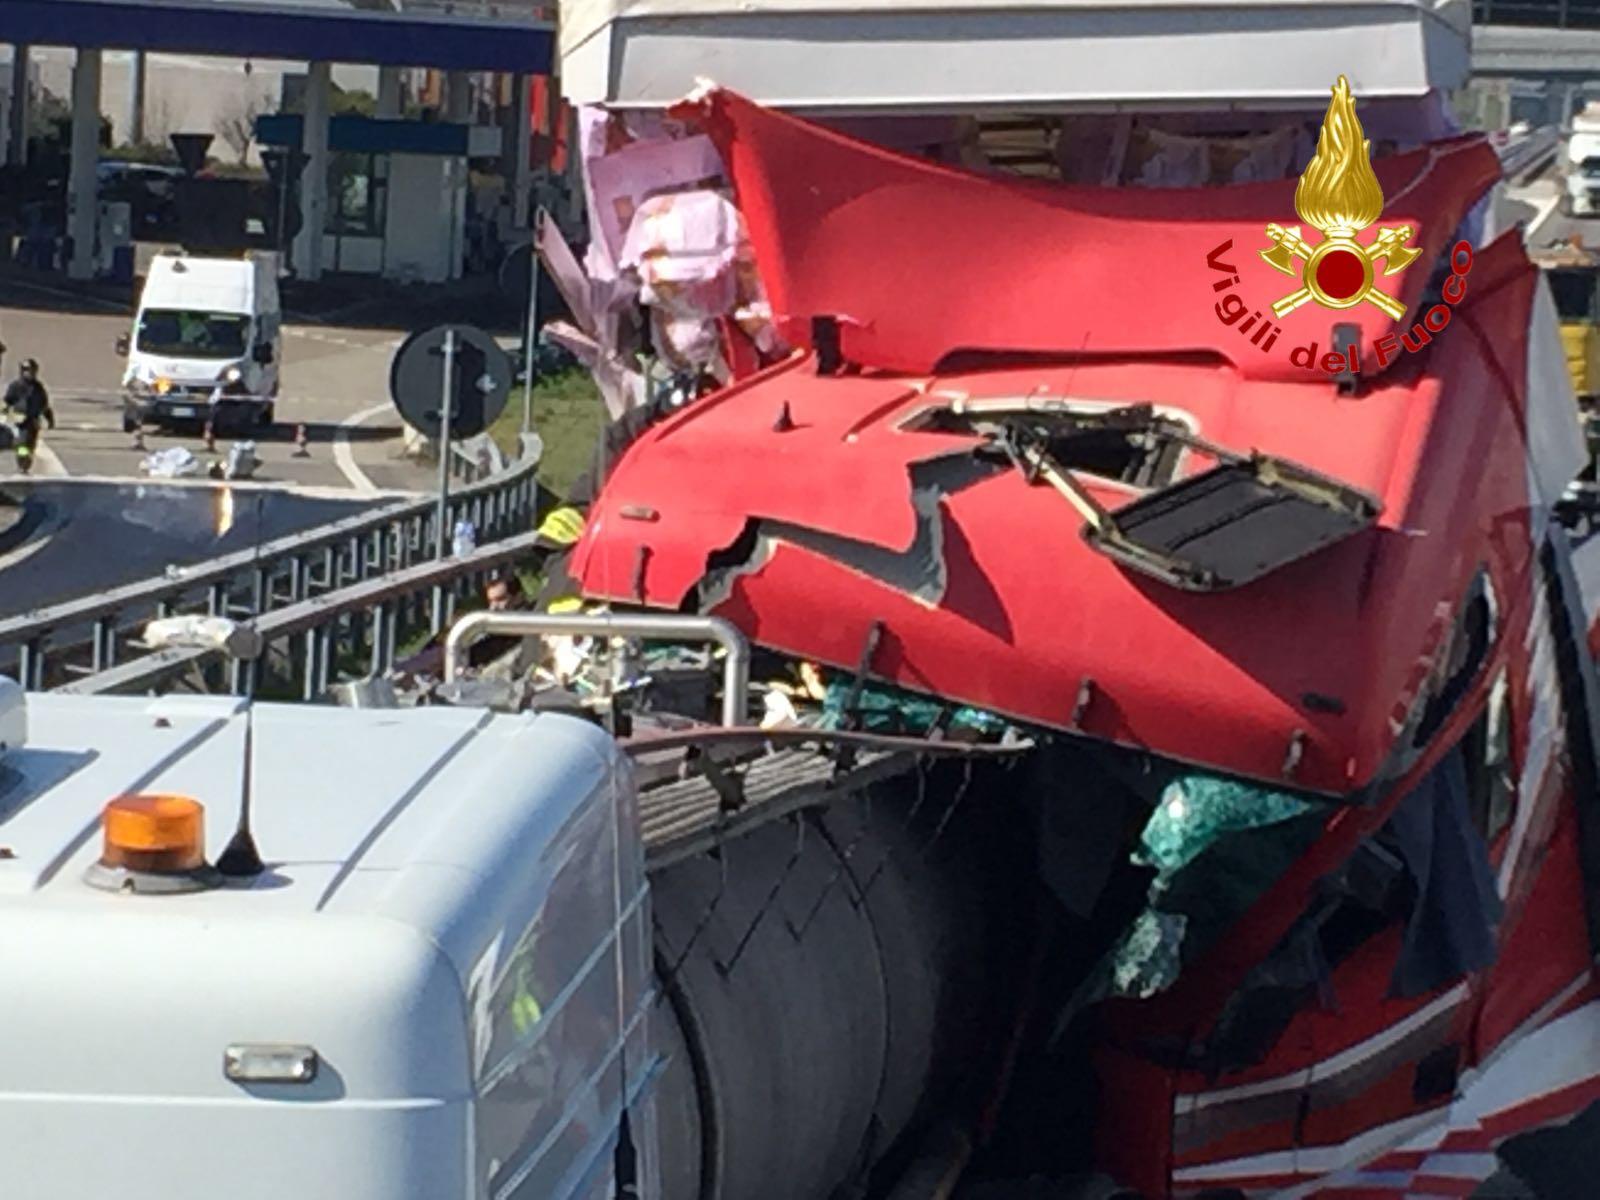 Scontro fra tir, emergenza in A4 per acido solforico sull'asfalto